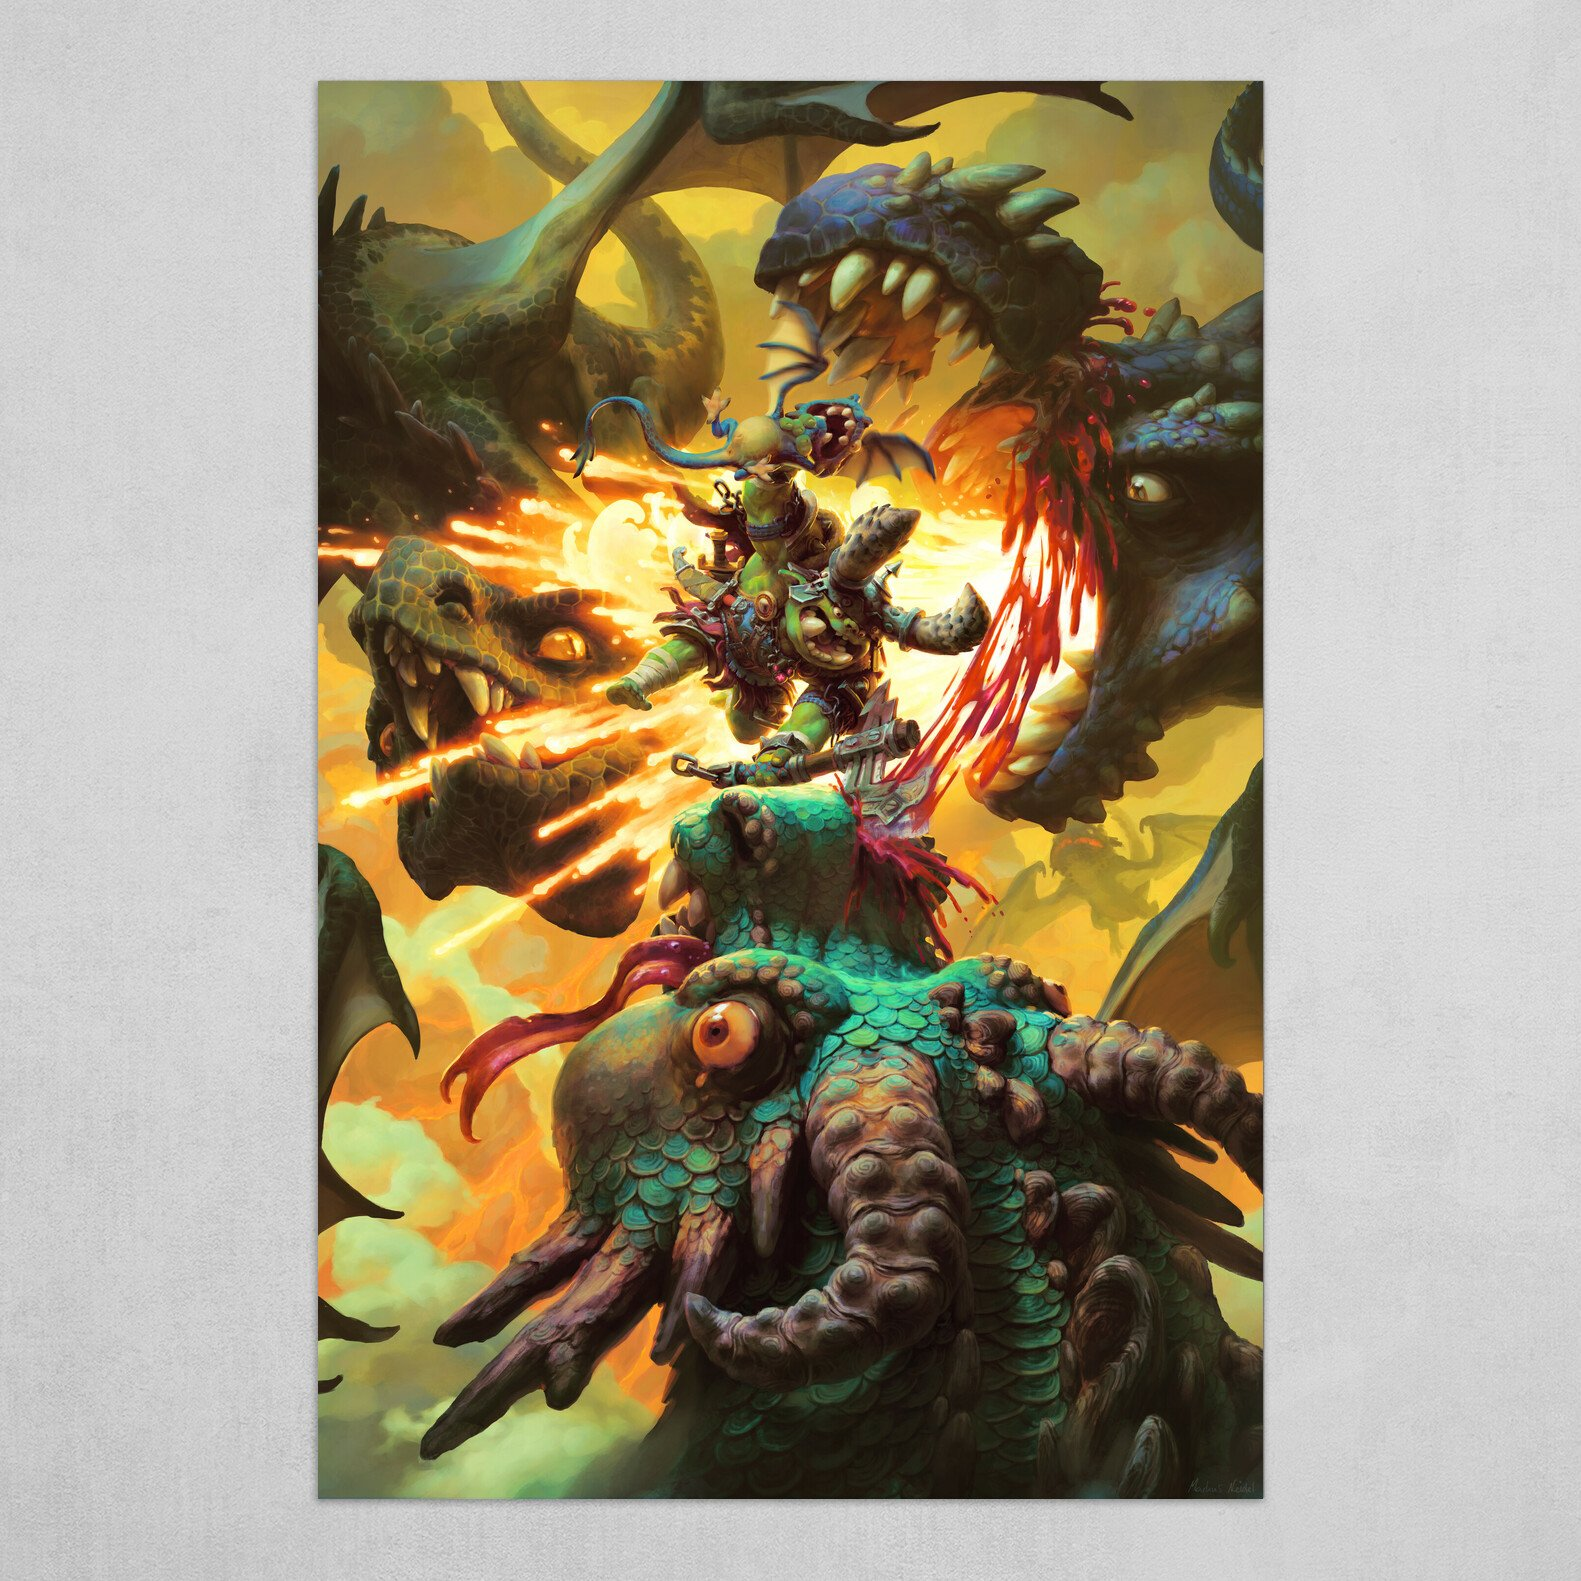 Ork Super-Chieftain